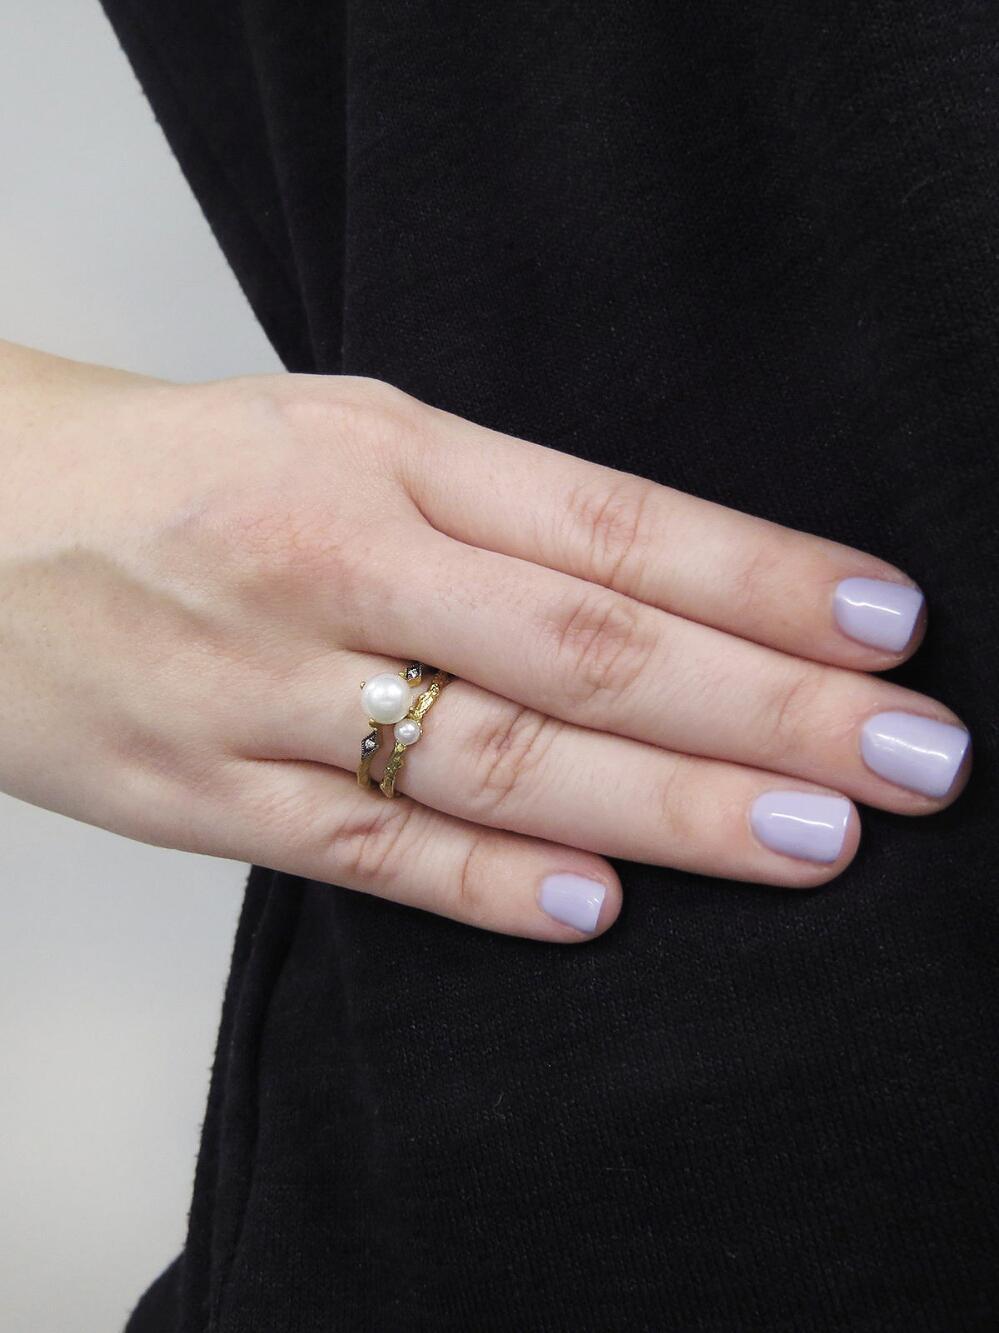 Lyst - Cathy waterman Pearl And Diamond Ring in Metallic